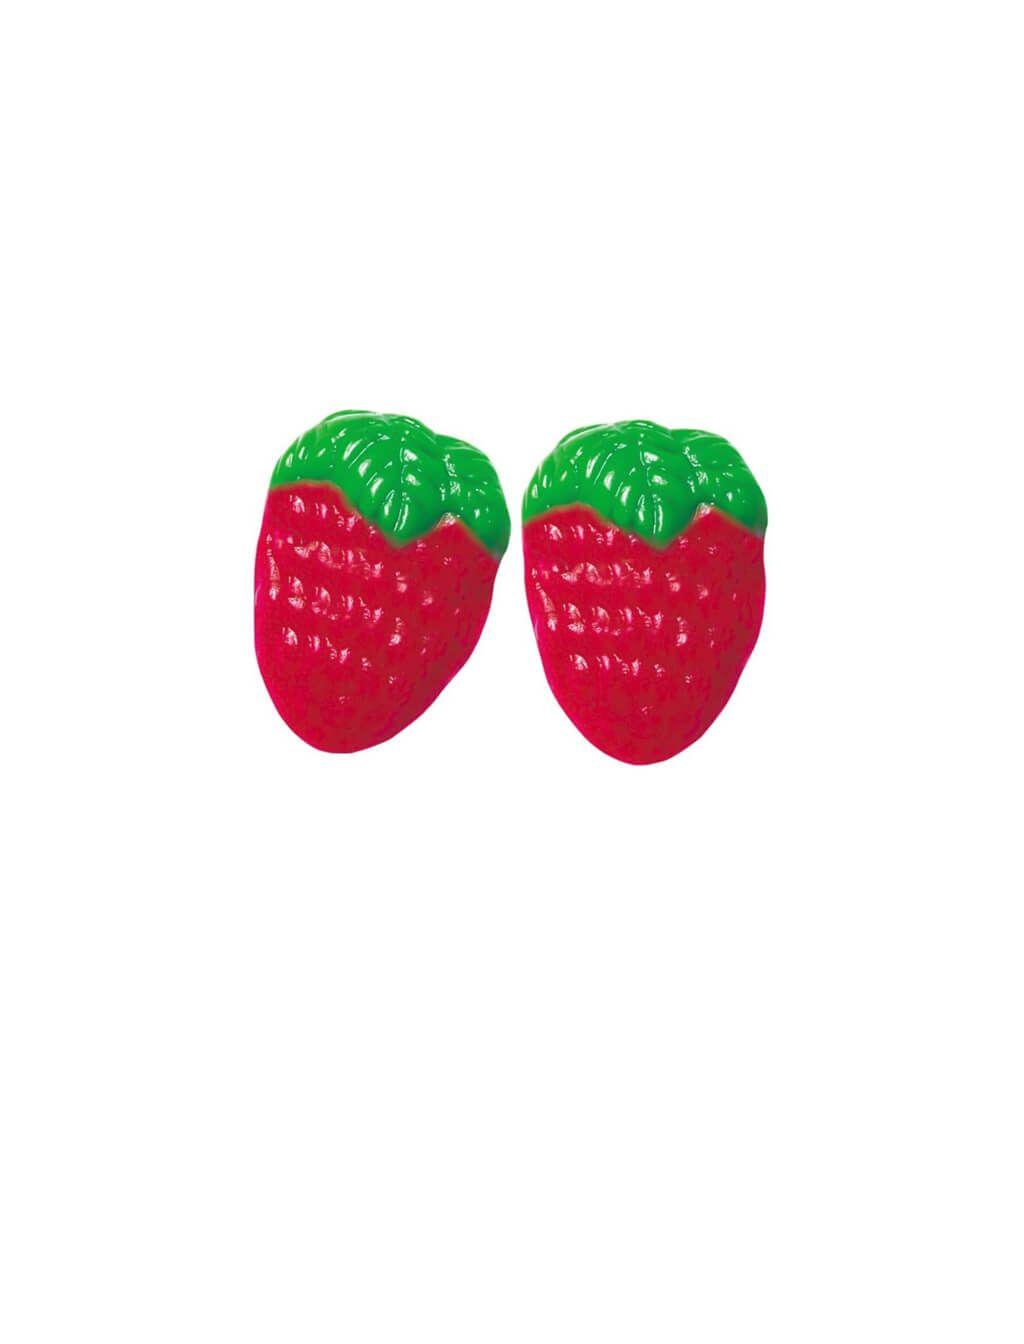 Fresas Silvestres bolsa 1,5 Kg